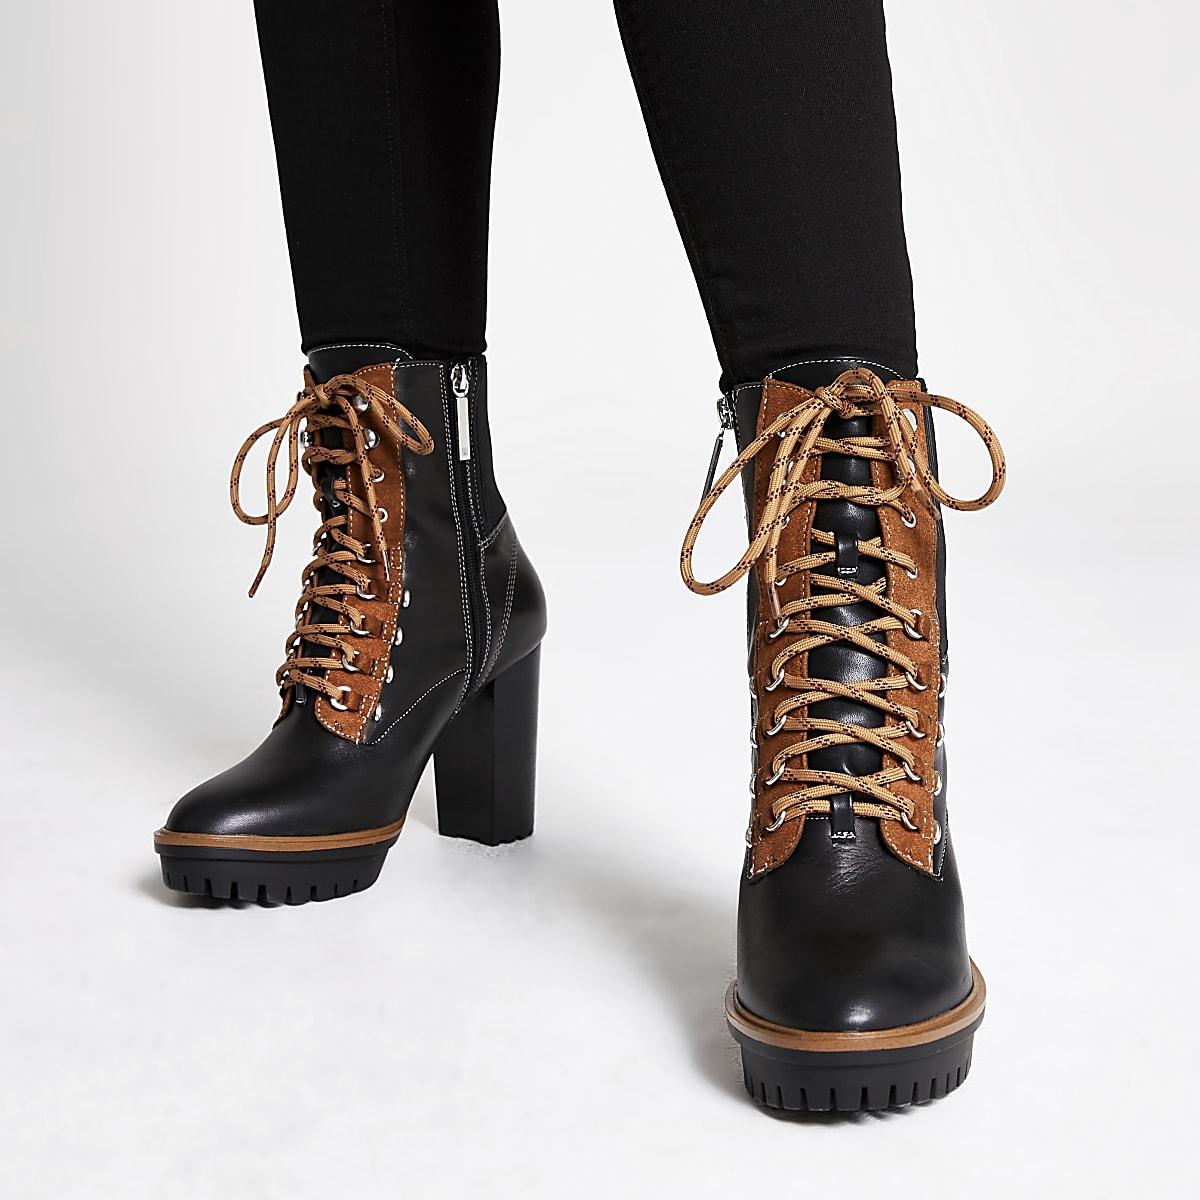 57134930f3e Black heeled lace up hiking boots